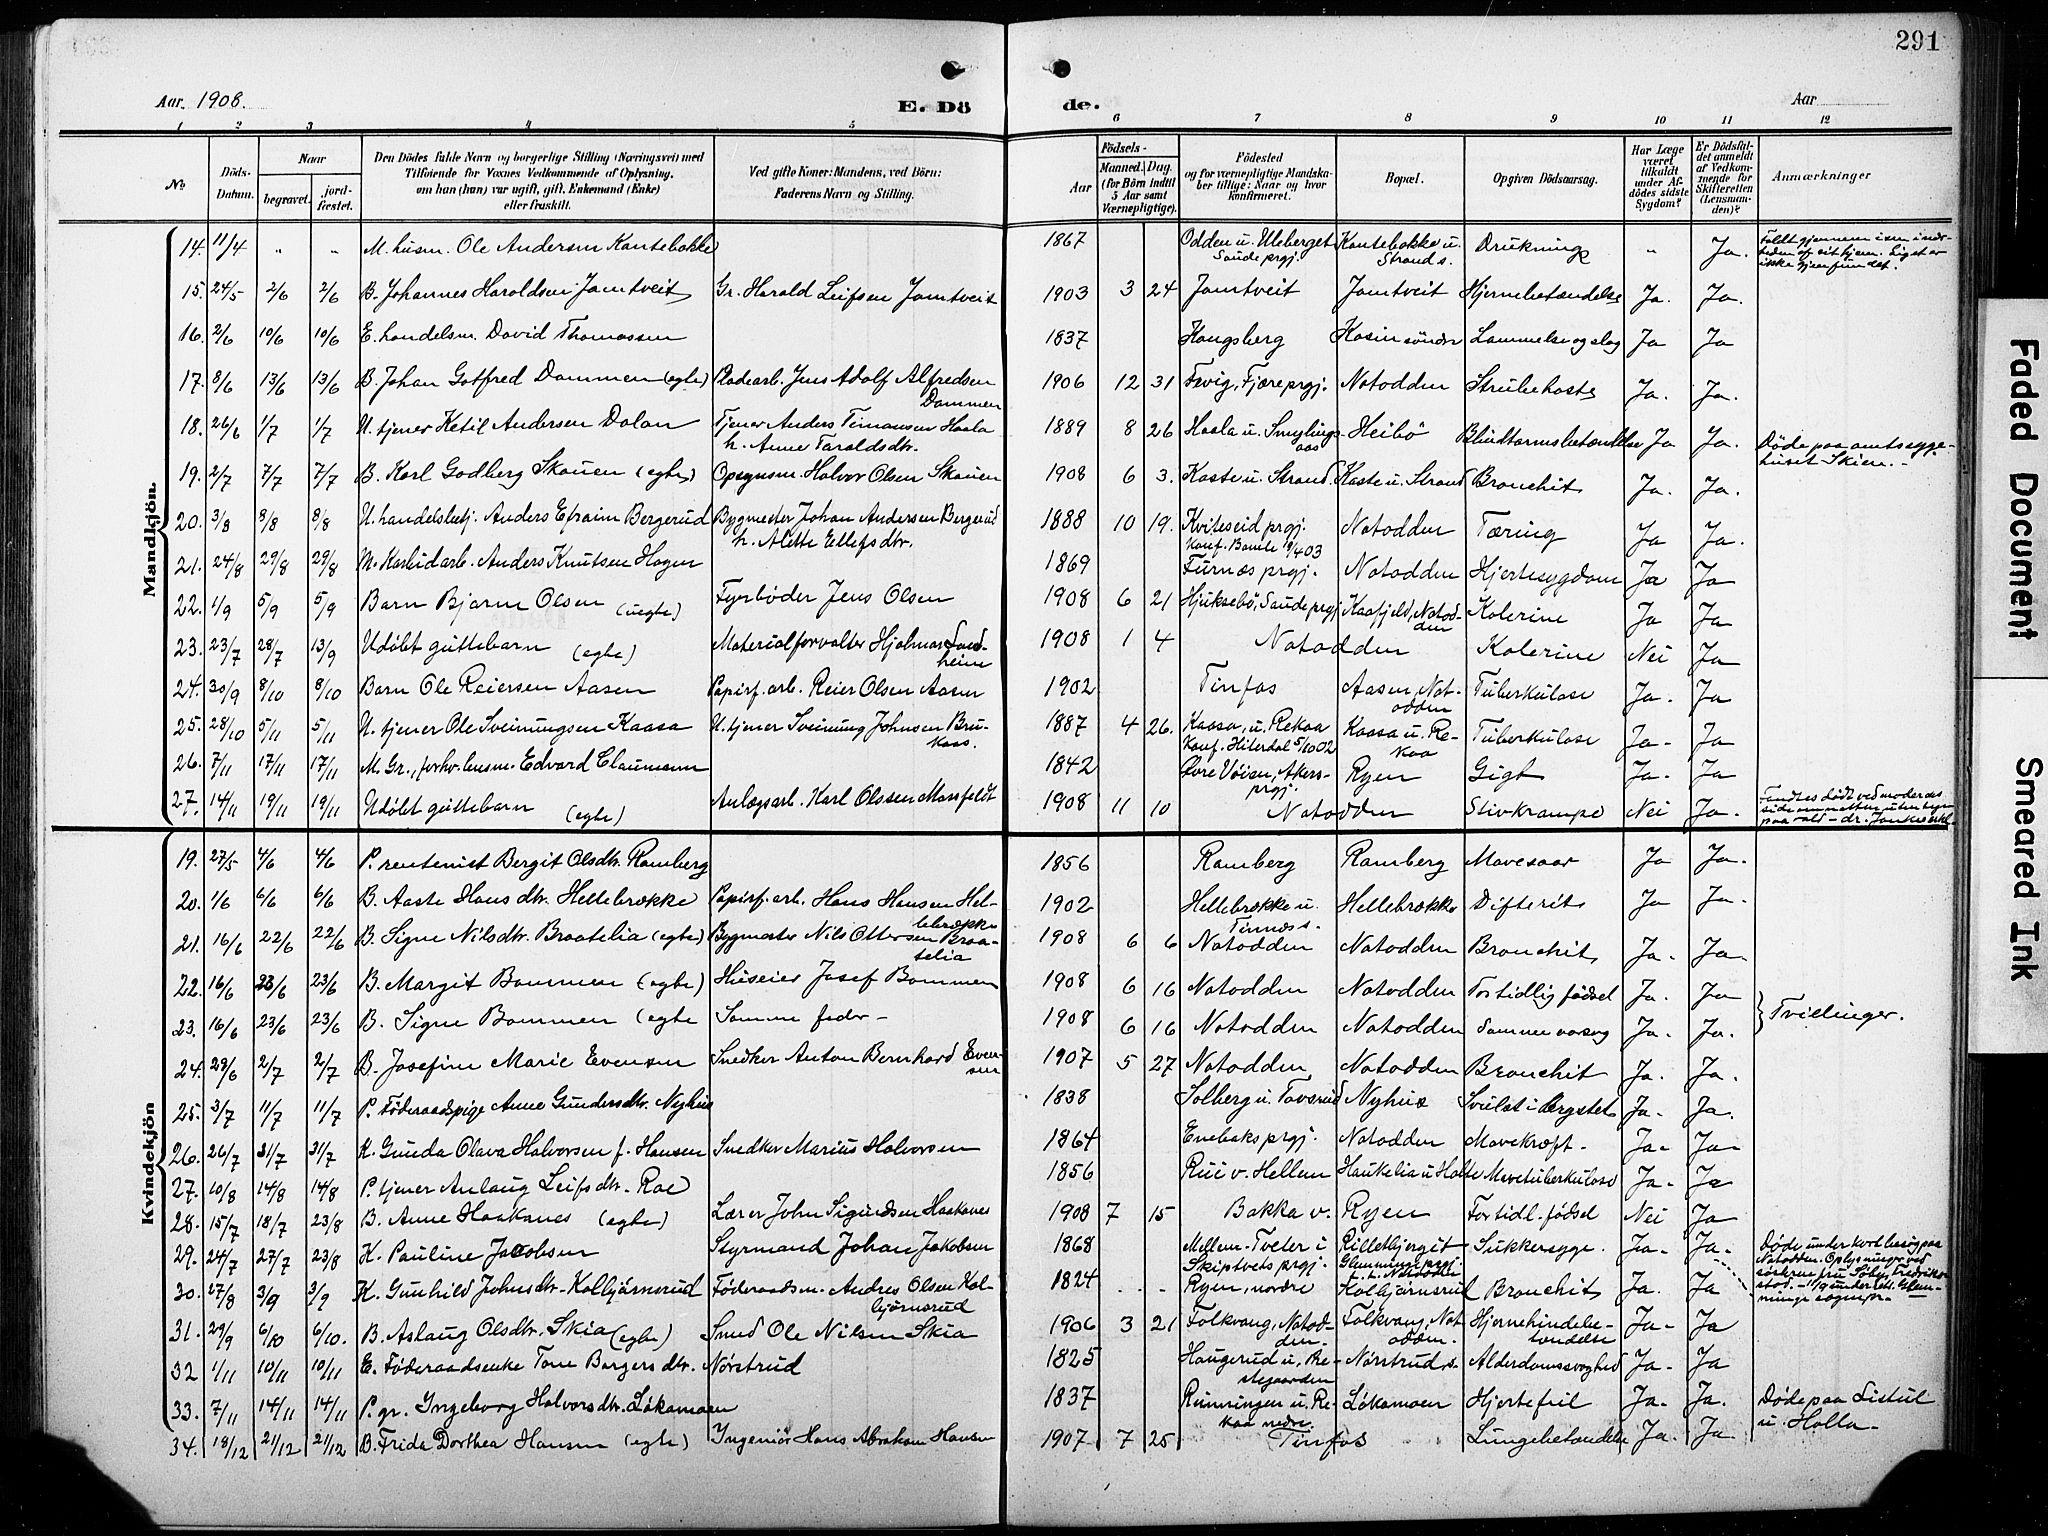 SAKO, Heddal kirkebøker, G/Ga/L0003: Klokkerbok nr. I 3, 1908-1932, s. 291